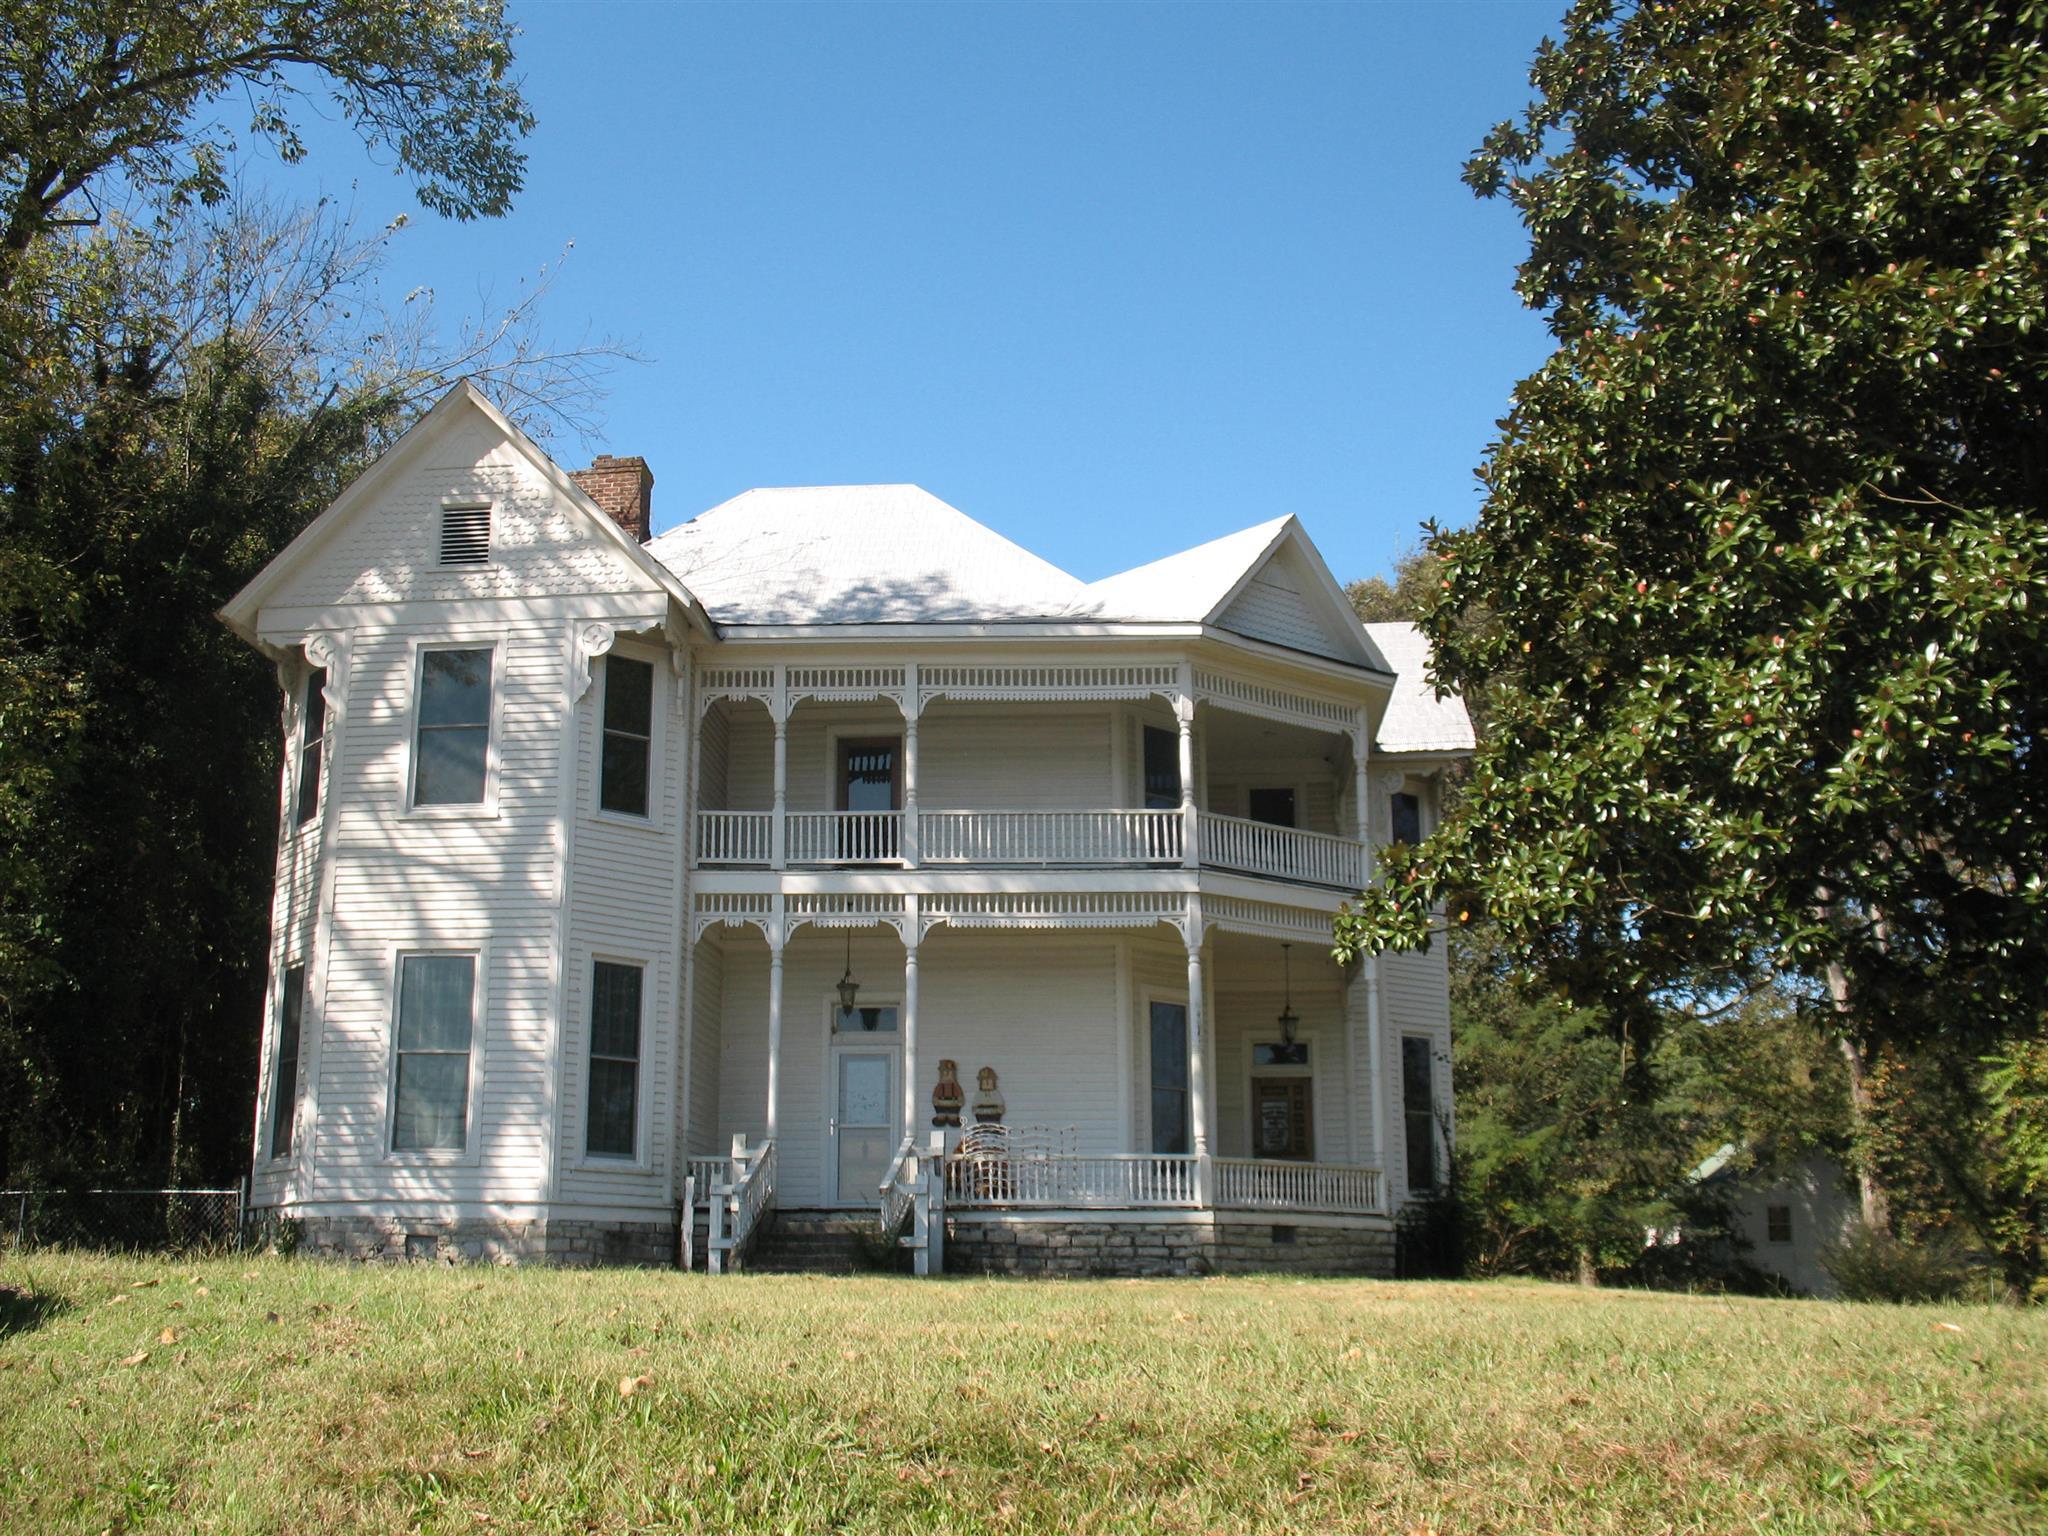 902 W Main St, Woodbury, TN 37190 - Woodbury, TN real estate listing